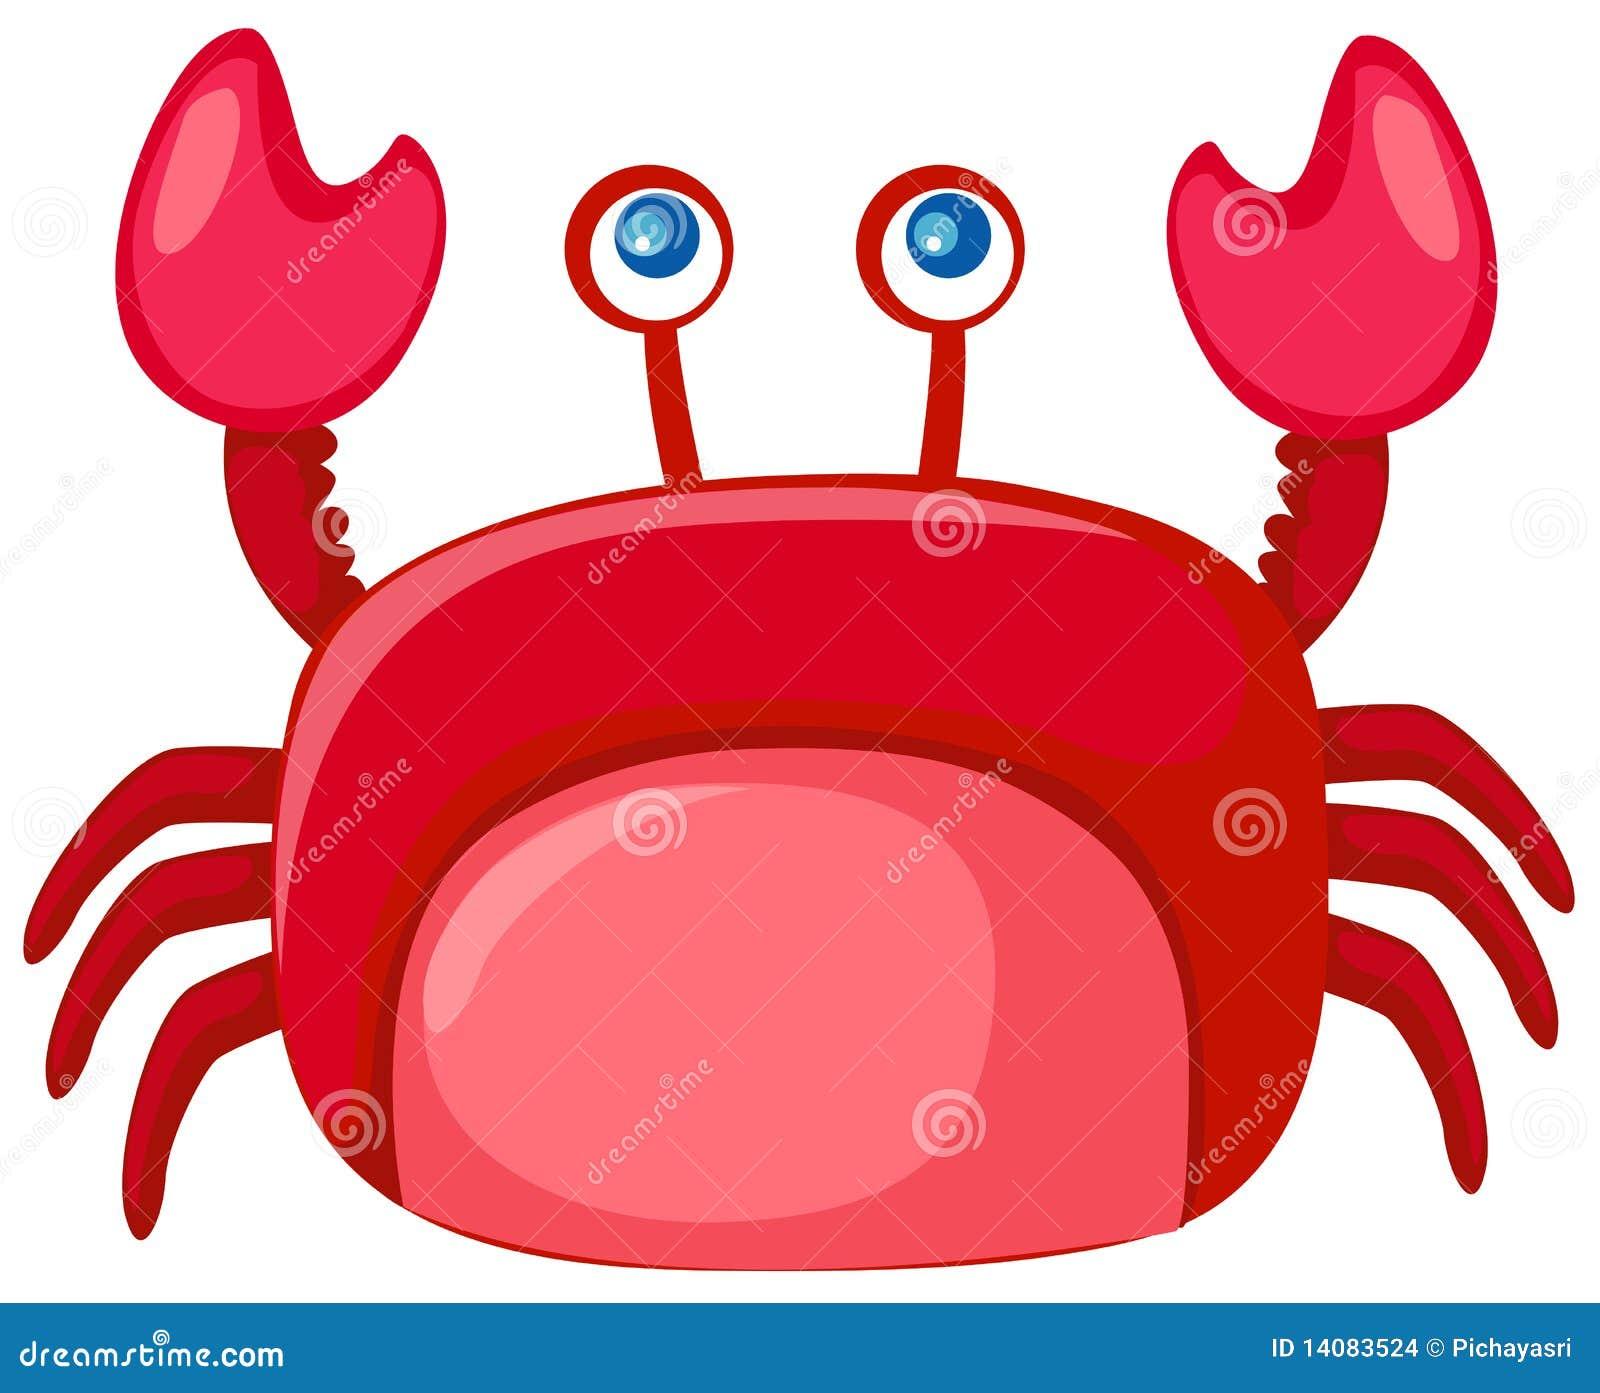 cartoon crab stock images image 14083524 Fresh Food Clip Art Sleeping Cot Clip Art